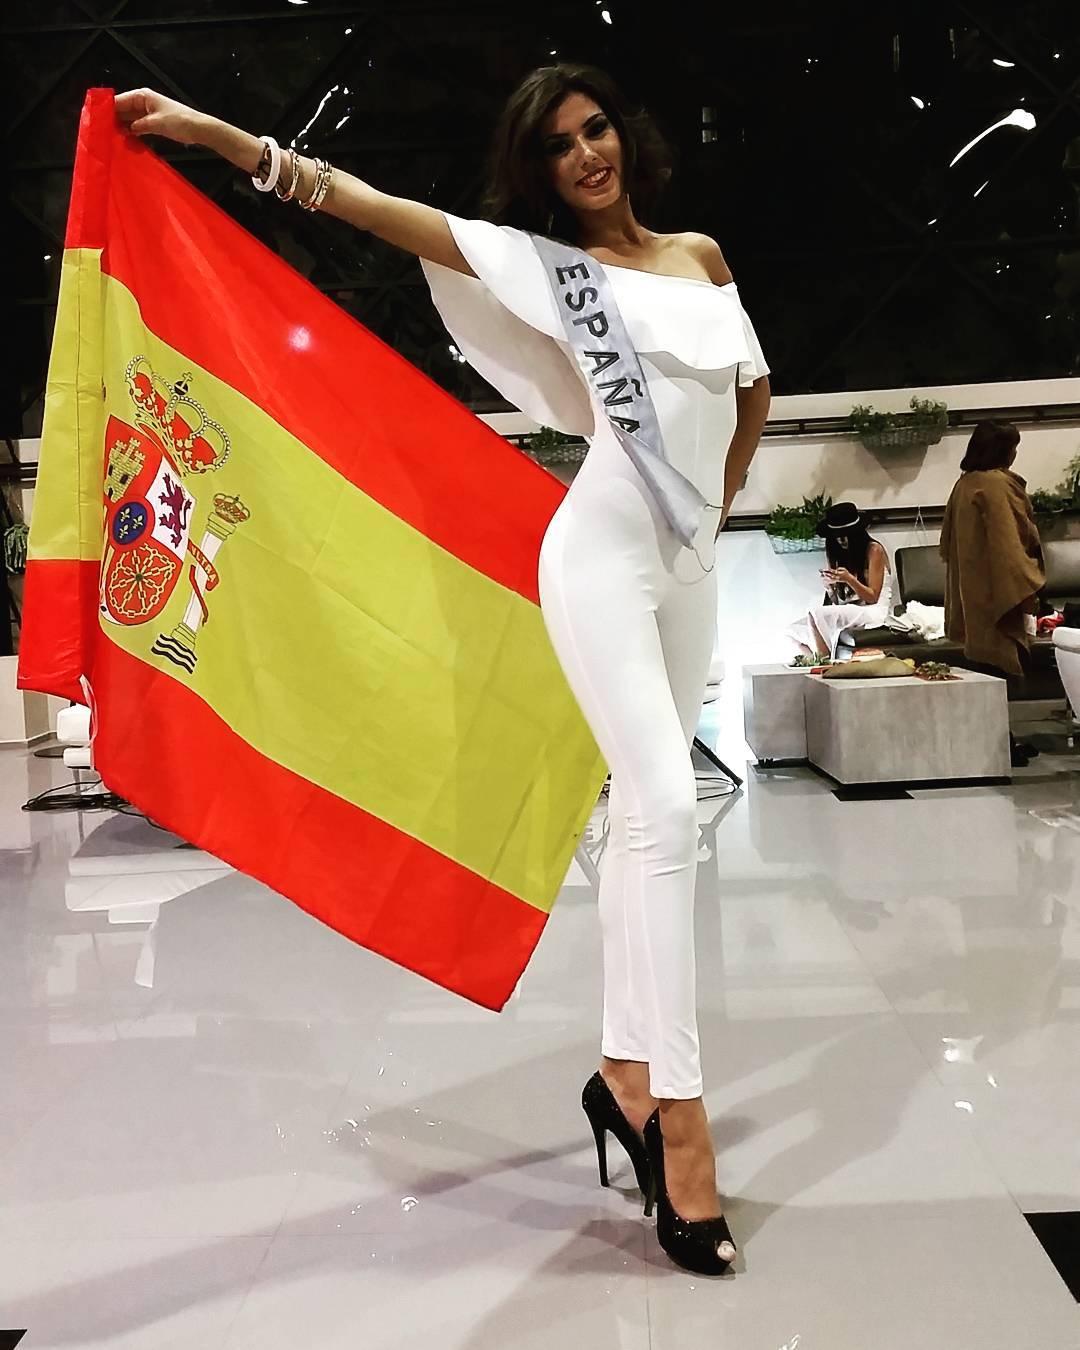 sofia del prado, top 10 de miss universe 2017/reyna hispanoamericana 2015/miss charm spain 2021. W96fdejv